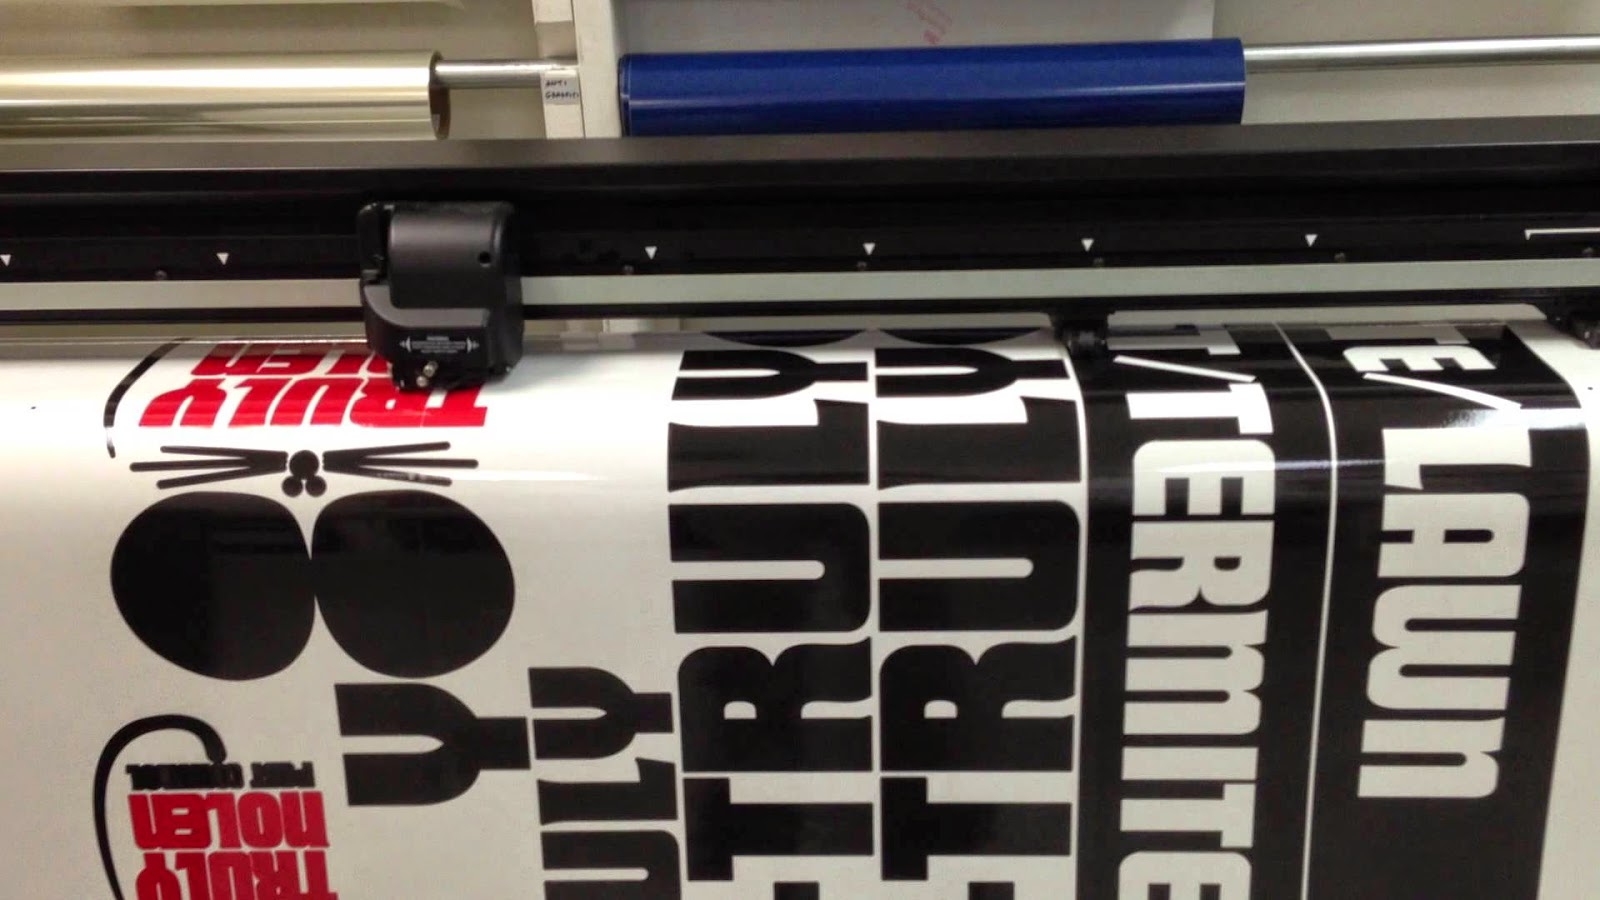 94b13921fe52 Μεταξοτυπίες Στάμπες μπλουζάκια Αυτοκόλλητα   Ψηφιακές Εκτυπώσεις